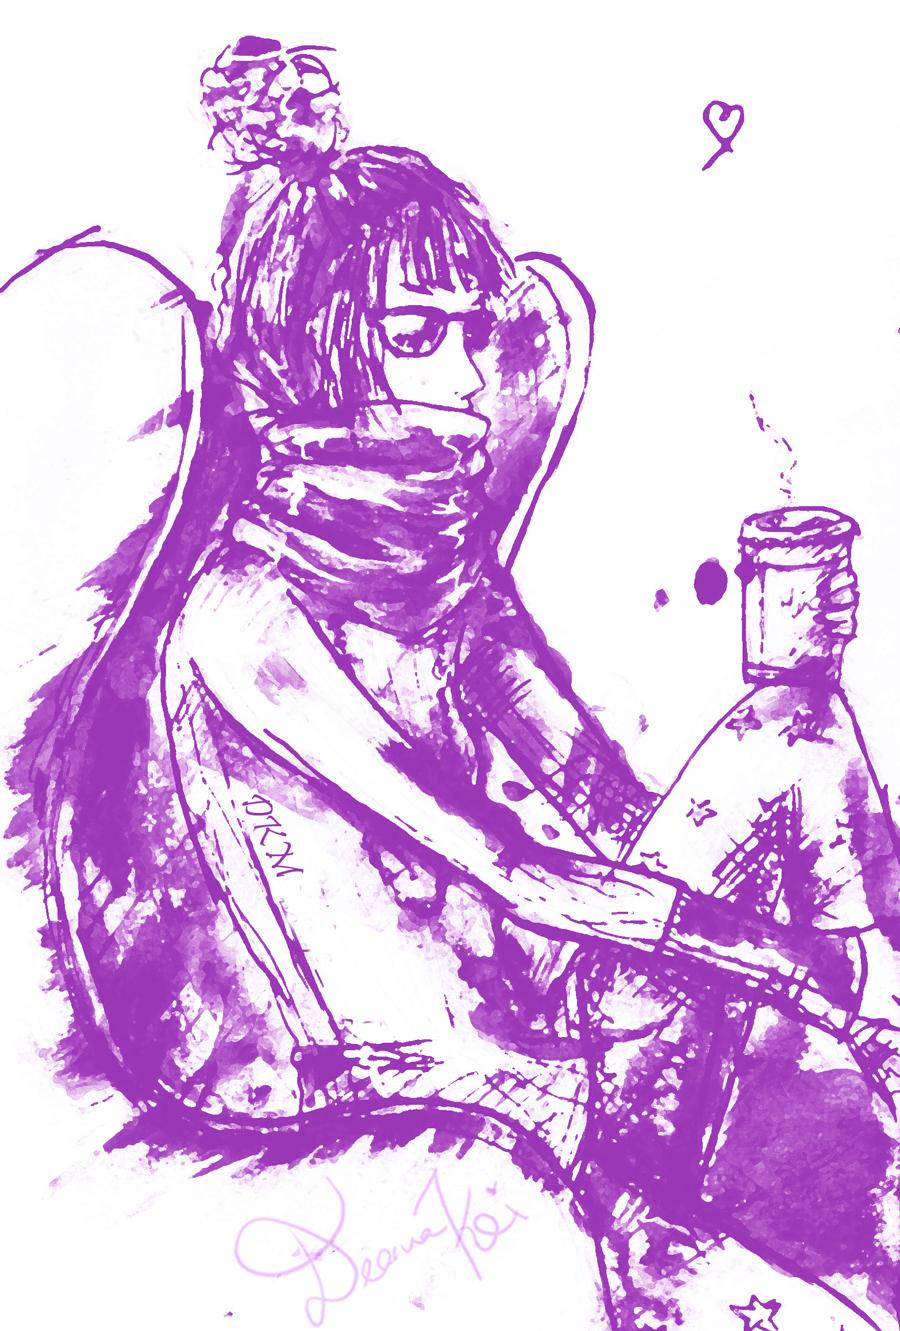 A self-sketch photo courtesy of Deanna Kei.